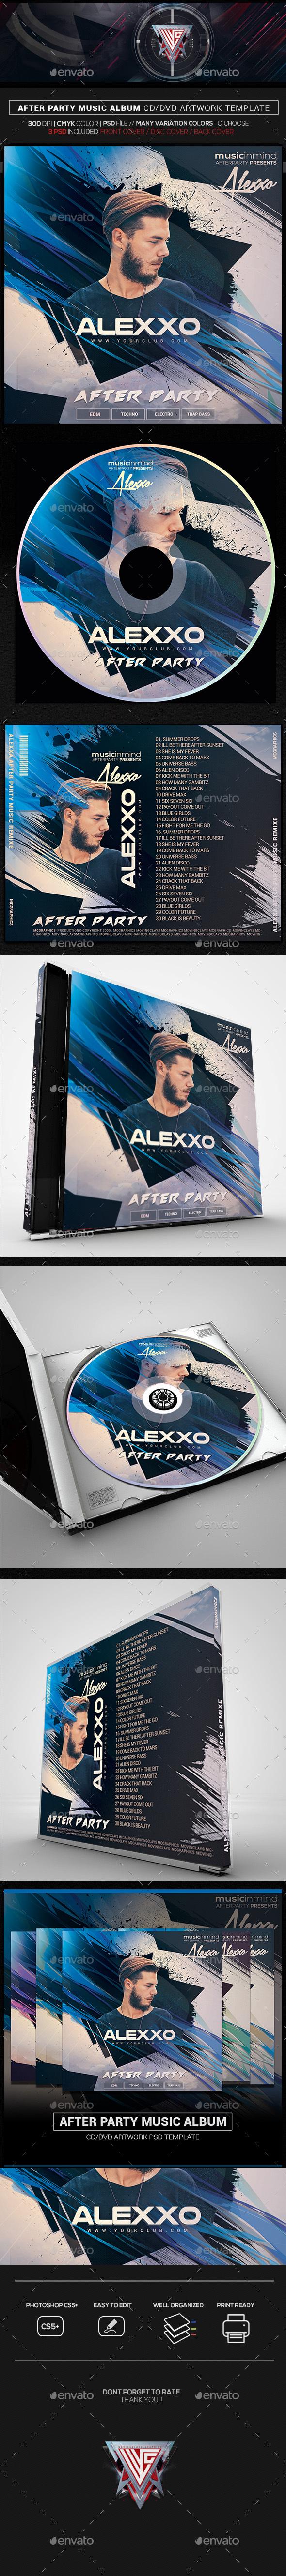 After Party Album Artwork CD/DVD Template - CD & DVD Artwork Print Templates